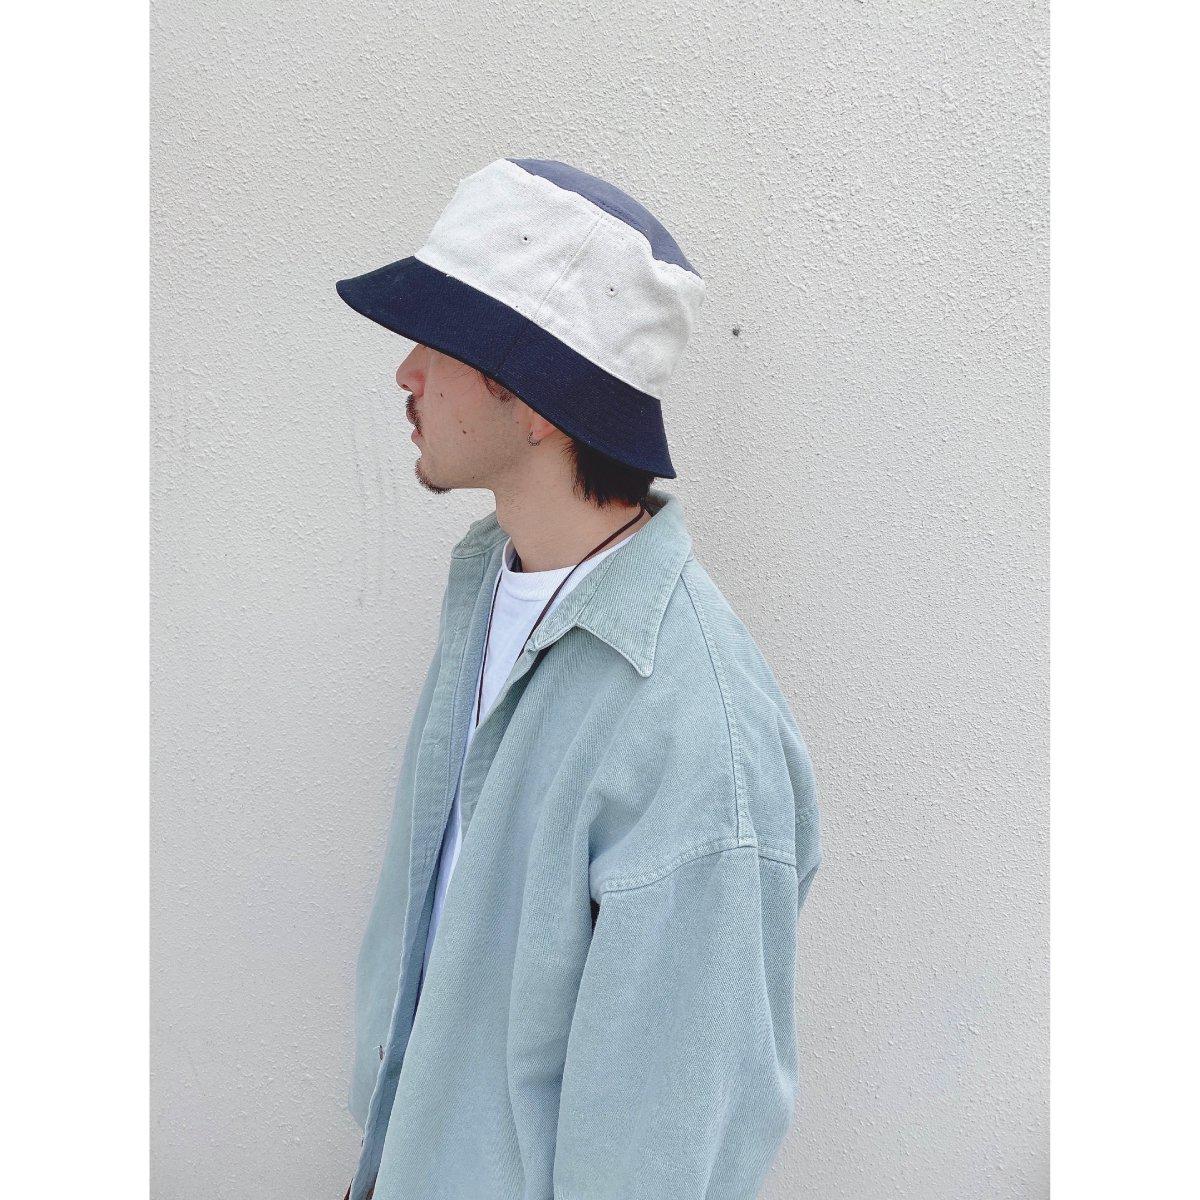 Repro Hat 詳細画像13